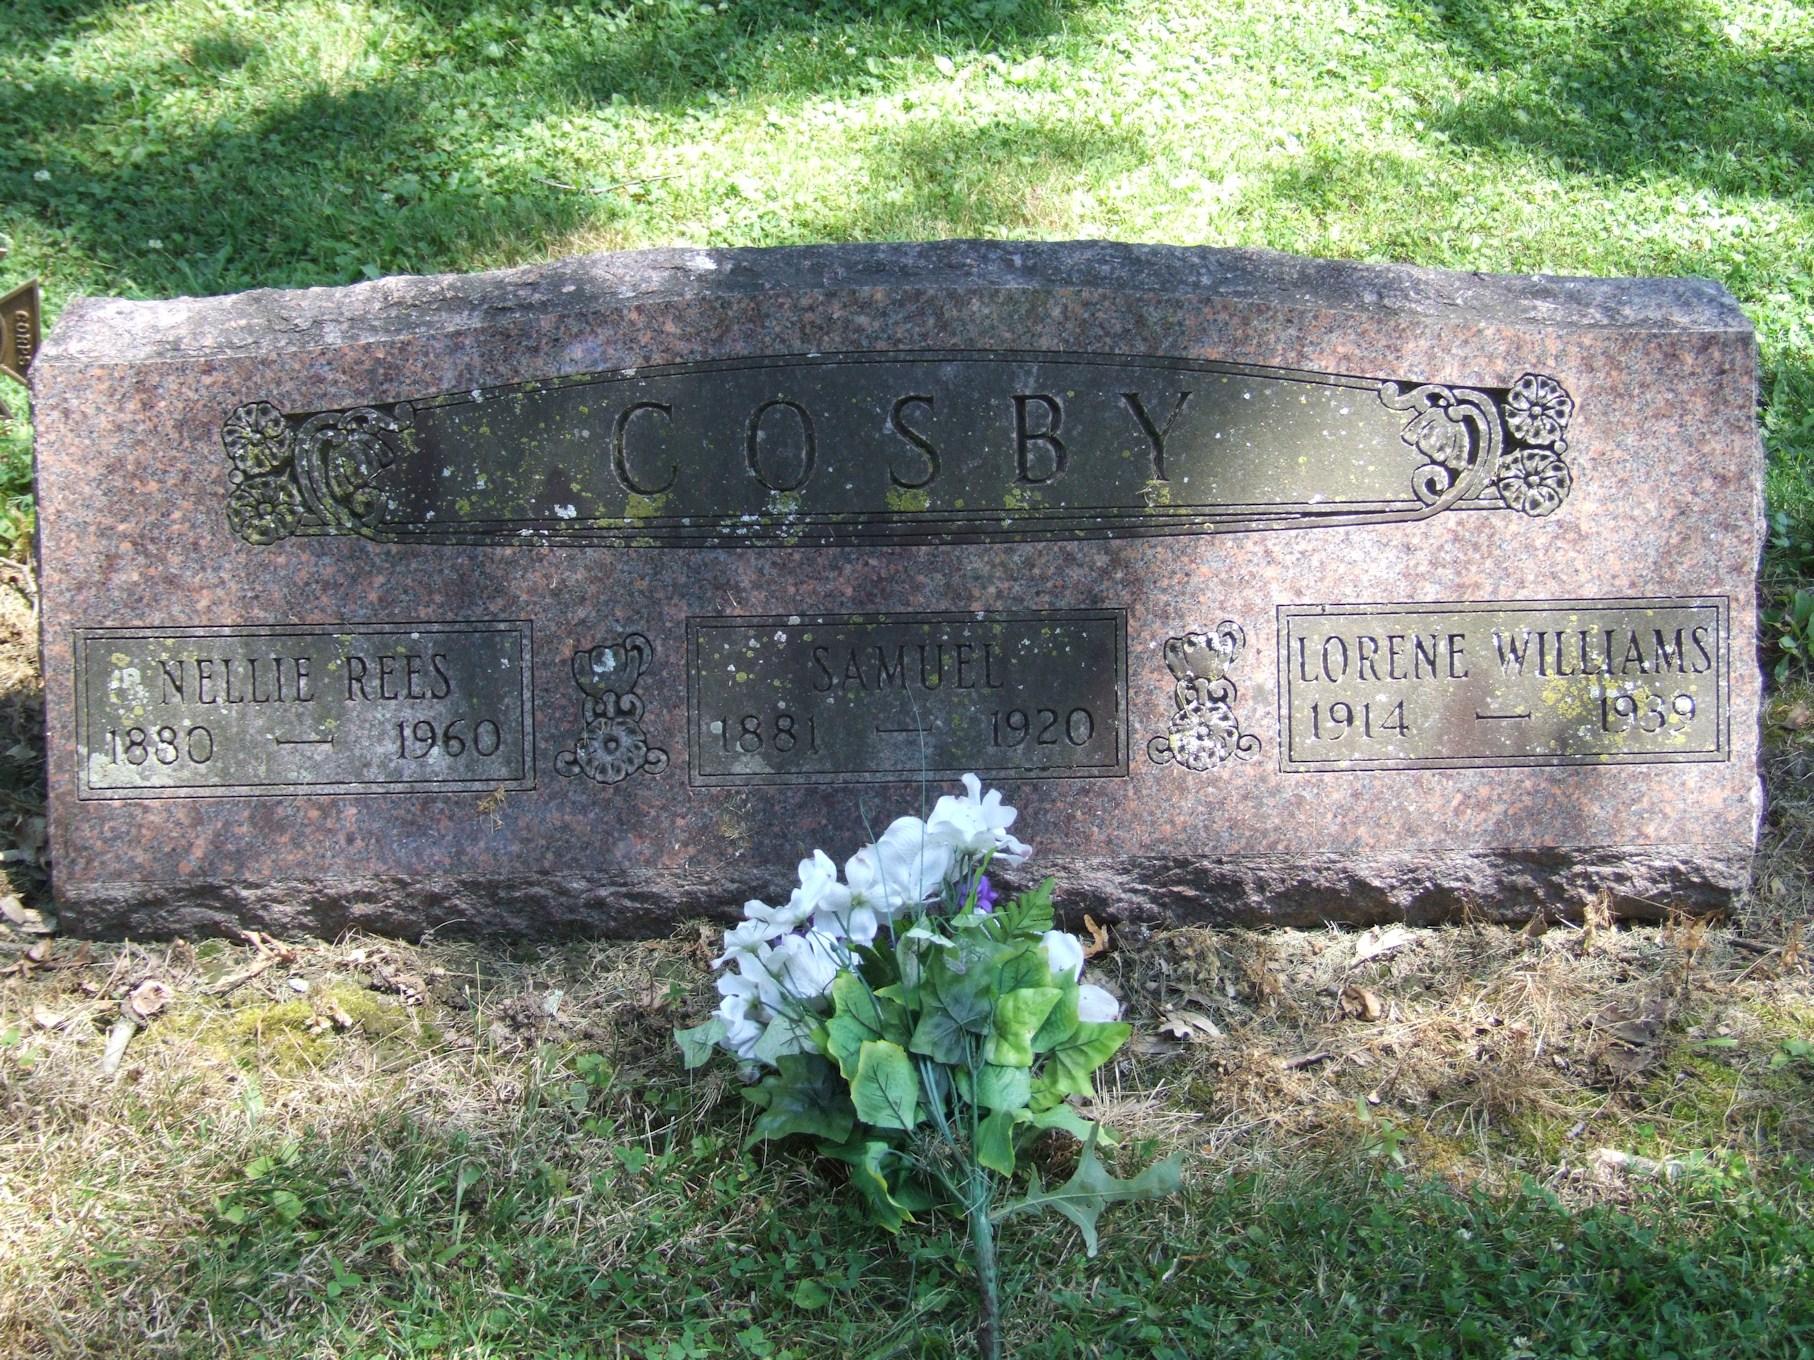 Samuel R Cosby